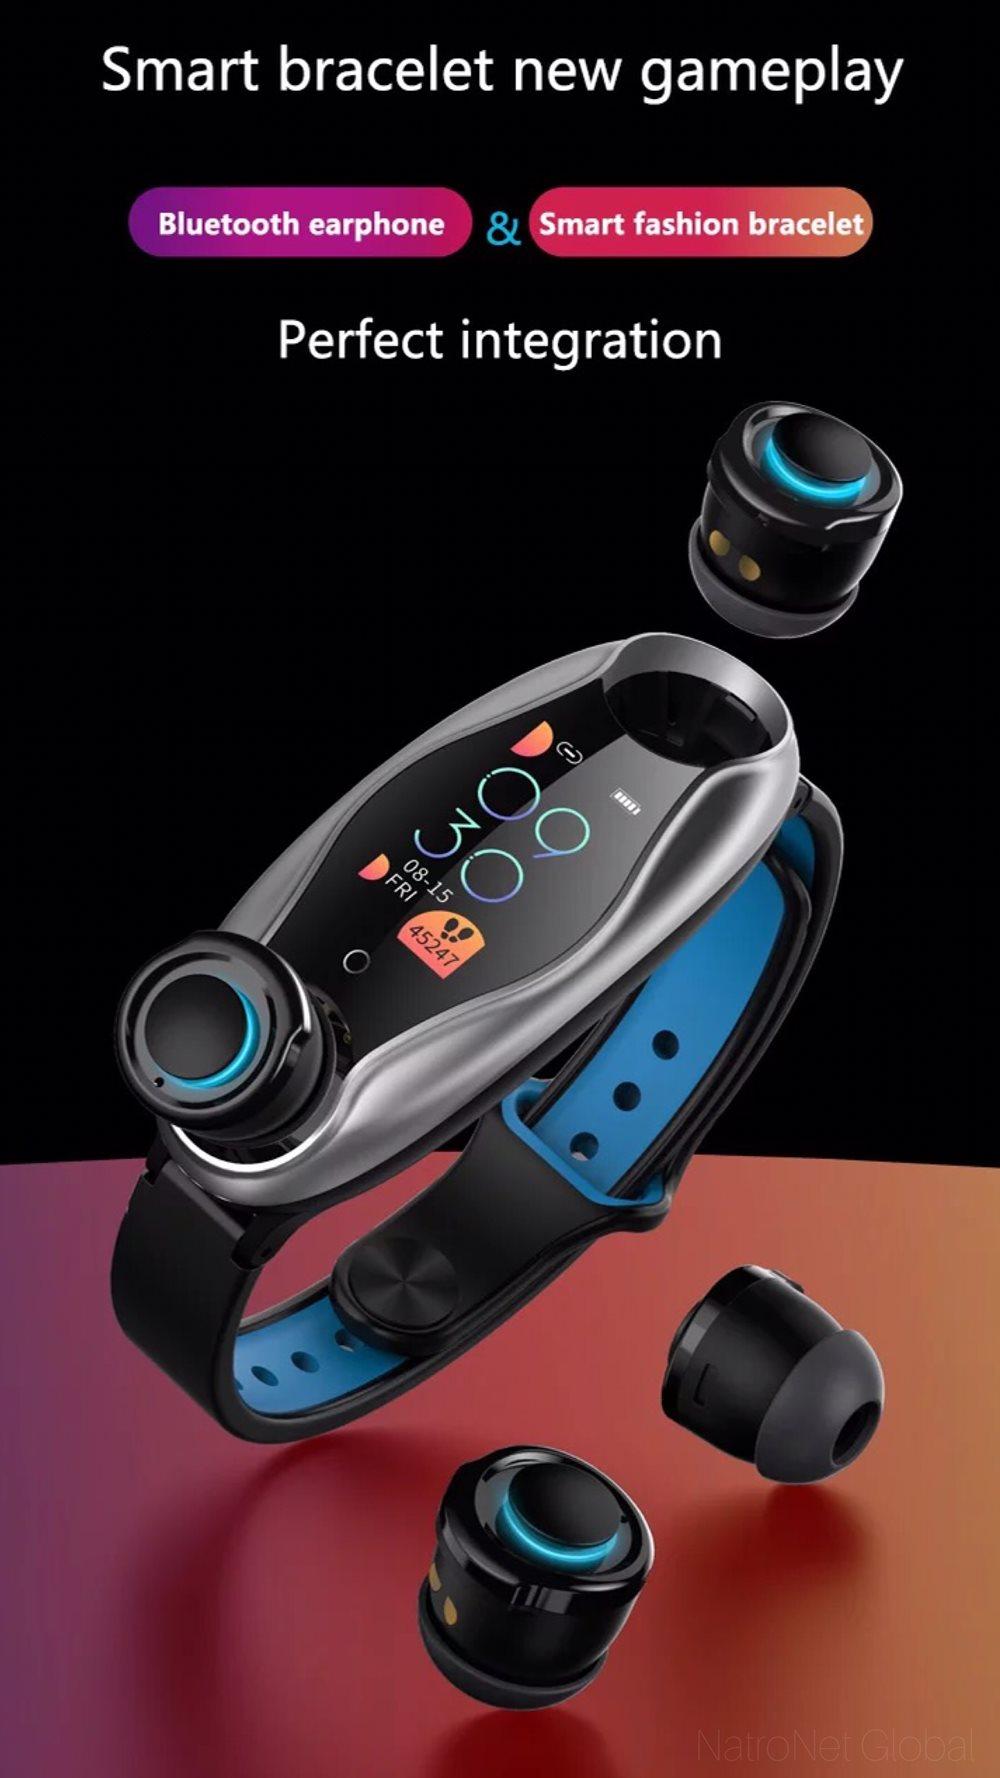 LEMFO LT04 Kablosuz Bluetooth Telefon Kulaklığı Renkli Ekran Akıllı bilekliK BT5.0